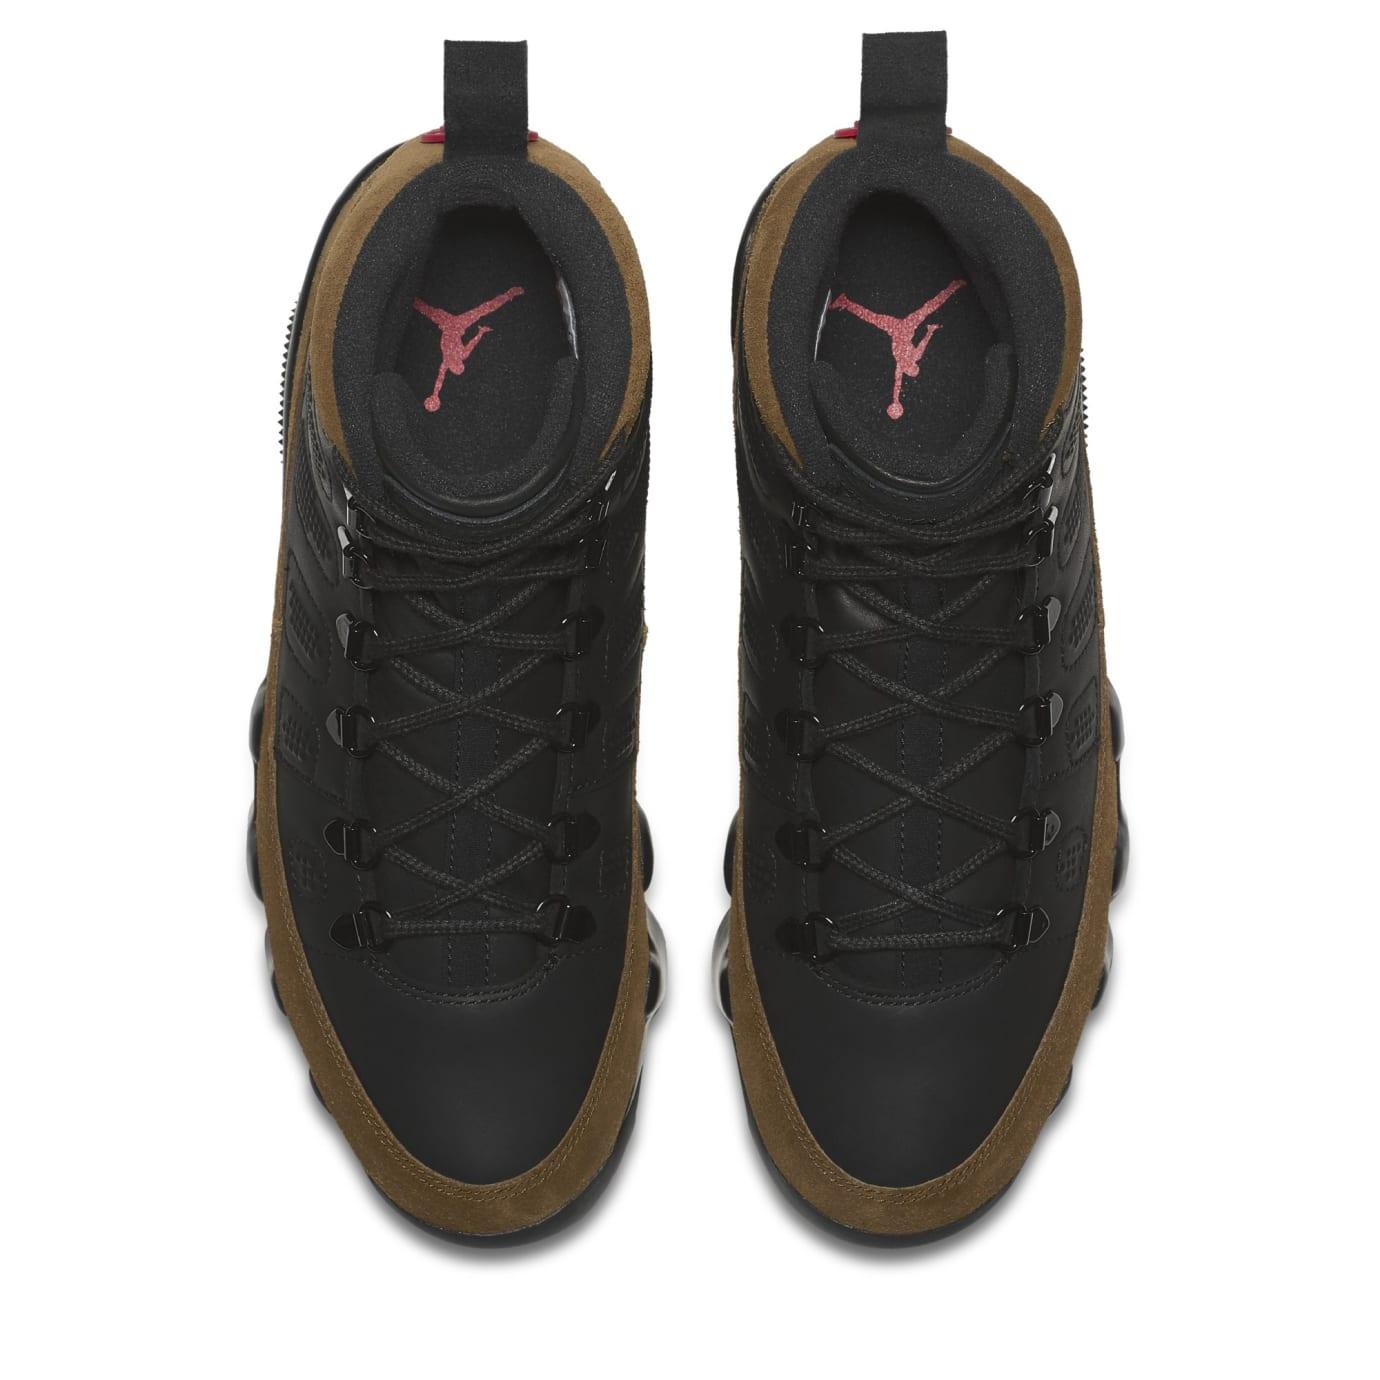 bd7b4128a8c062 Image via Nike Air Jordan 9 NRG Boot  Olive  AR4491-012 (Top)